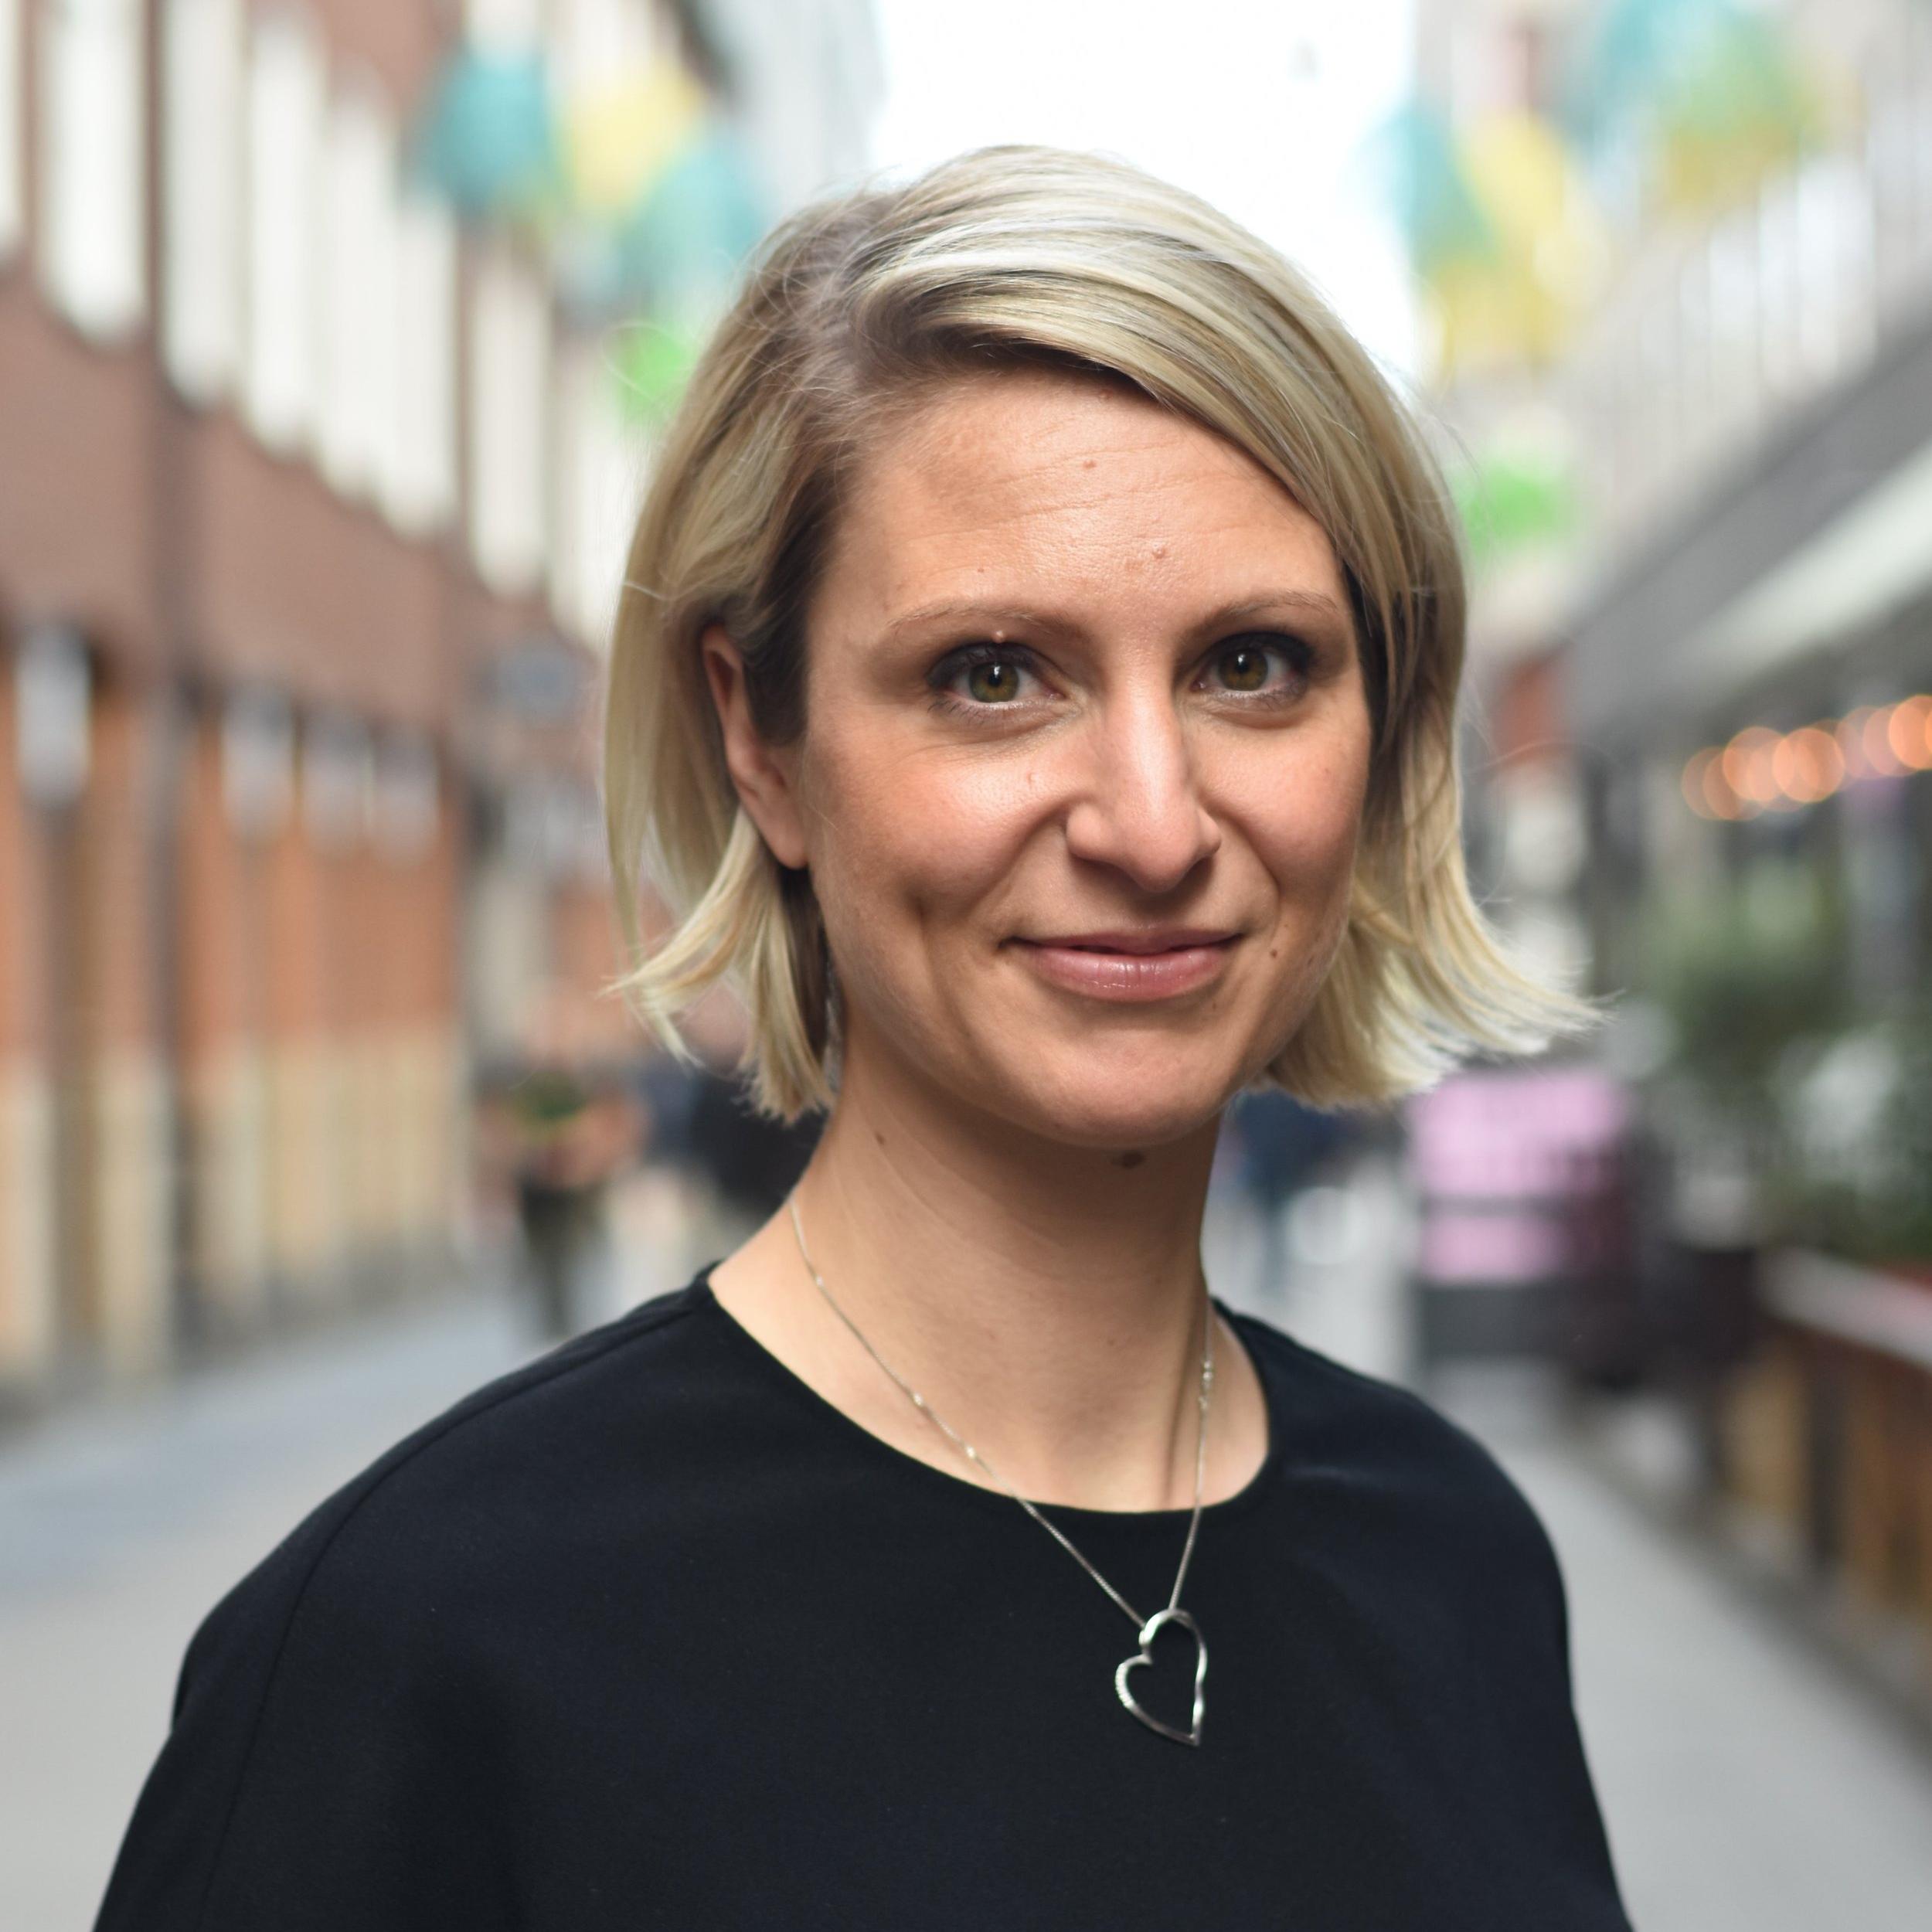 Helena Sjöström   helena.sjostrom@noxconsulting.se